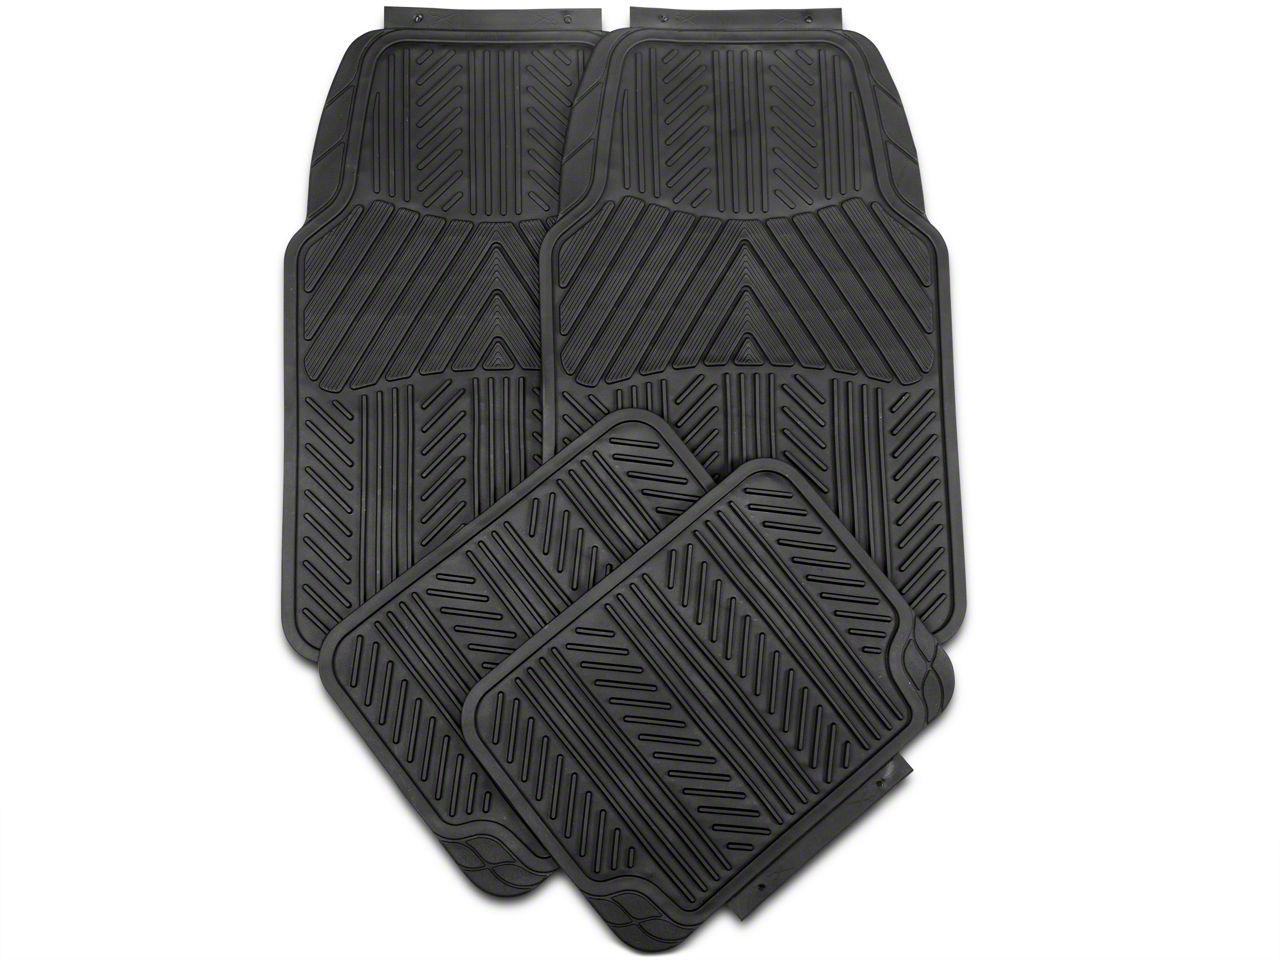 Covercraft Gray Premier Berber Custom Fit Floormat-4 pc mat Set 2761062-47